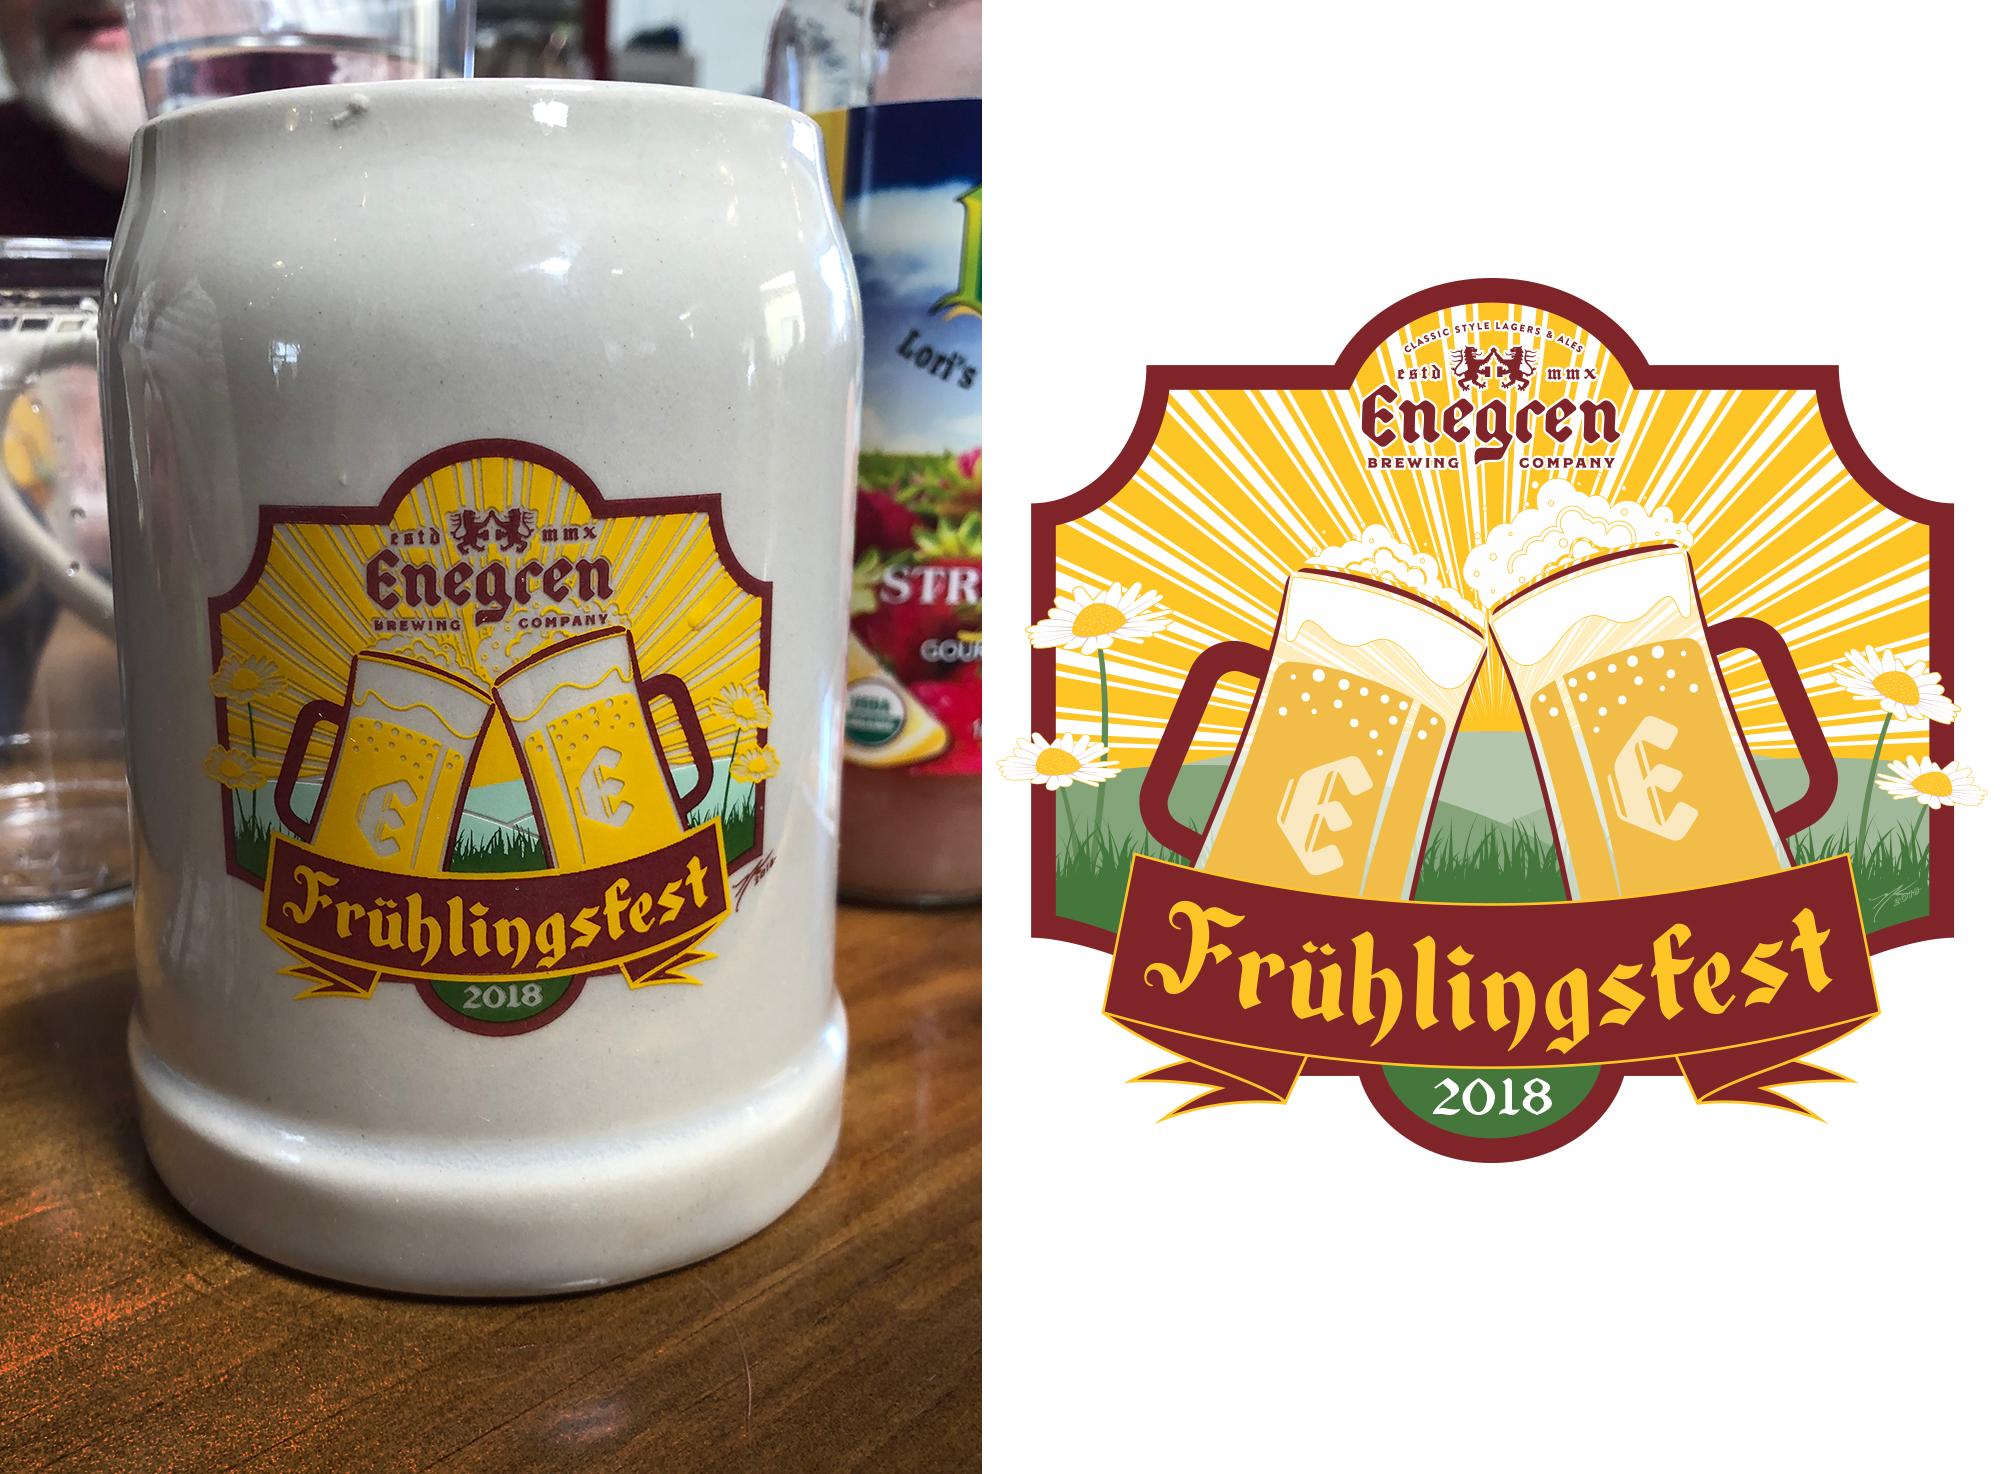 Enegren Brewing Frühlingsfest 2018 Stein Design